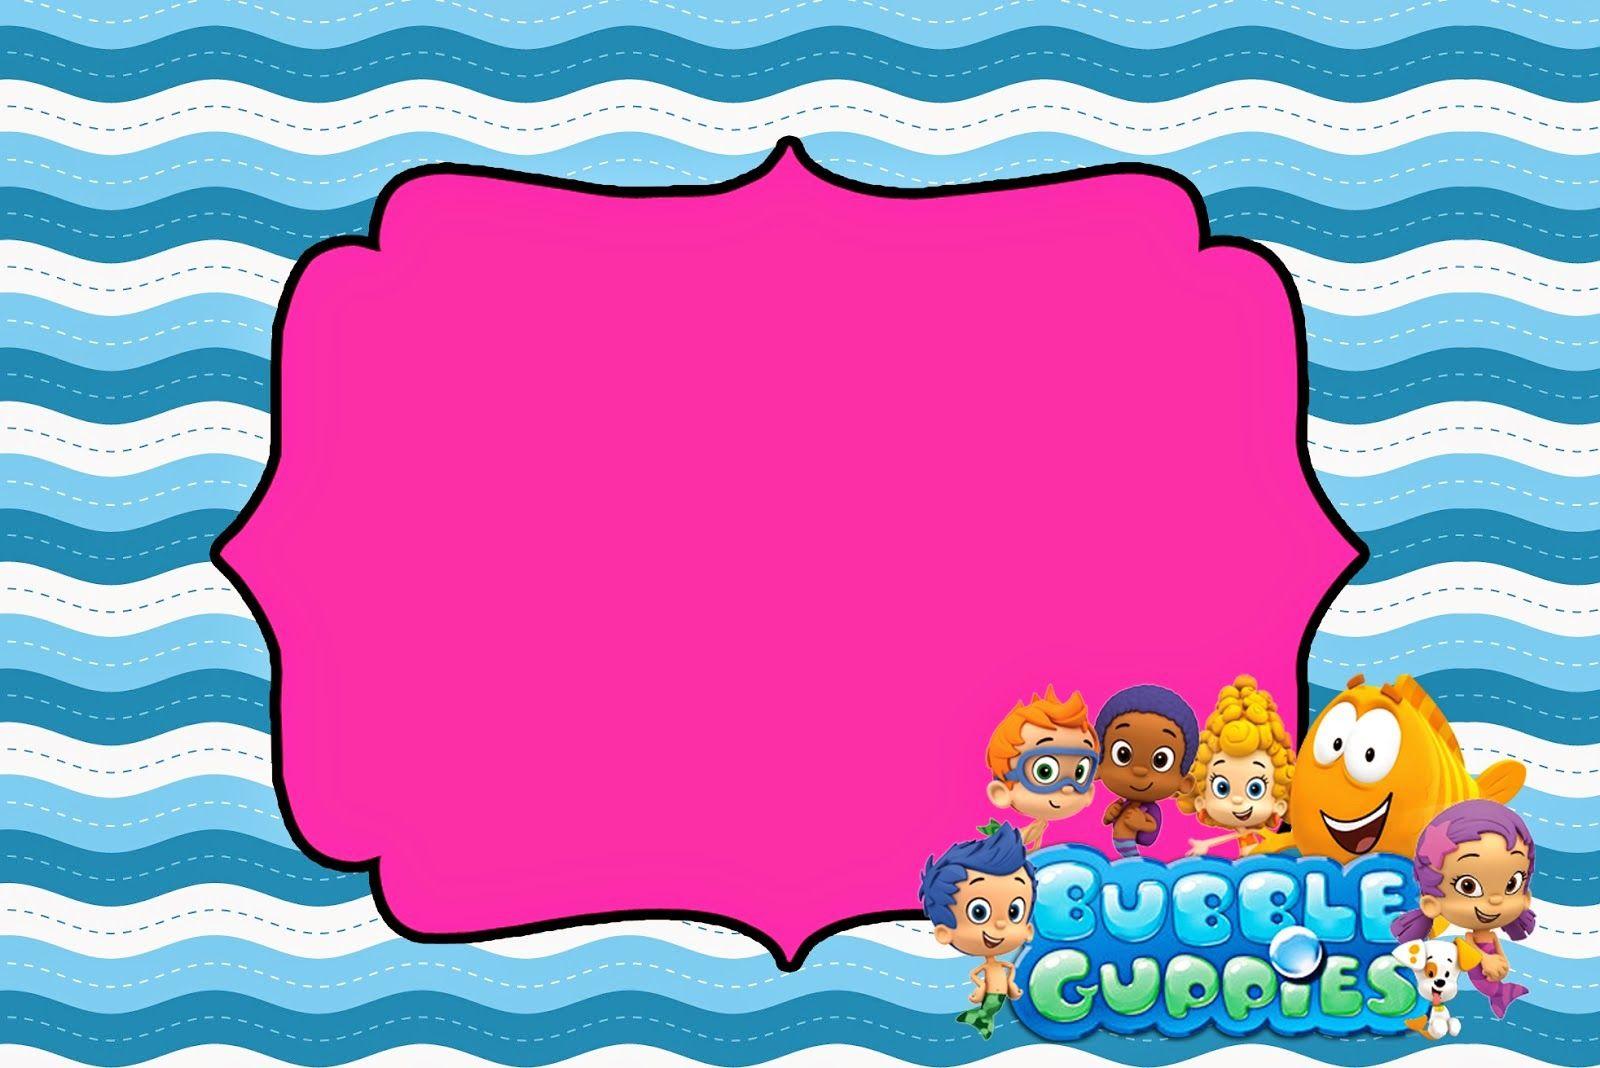 invitacion para Valentina | tarjeta | Pinterest | Guppy, Bubble ...